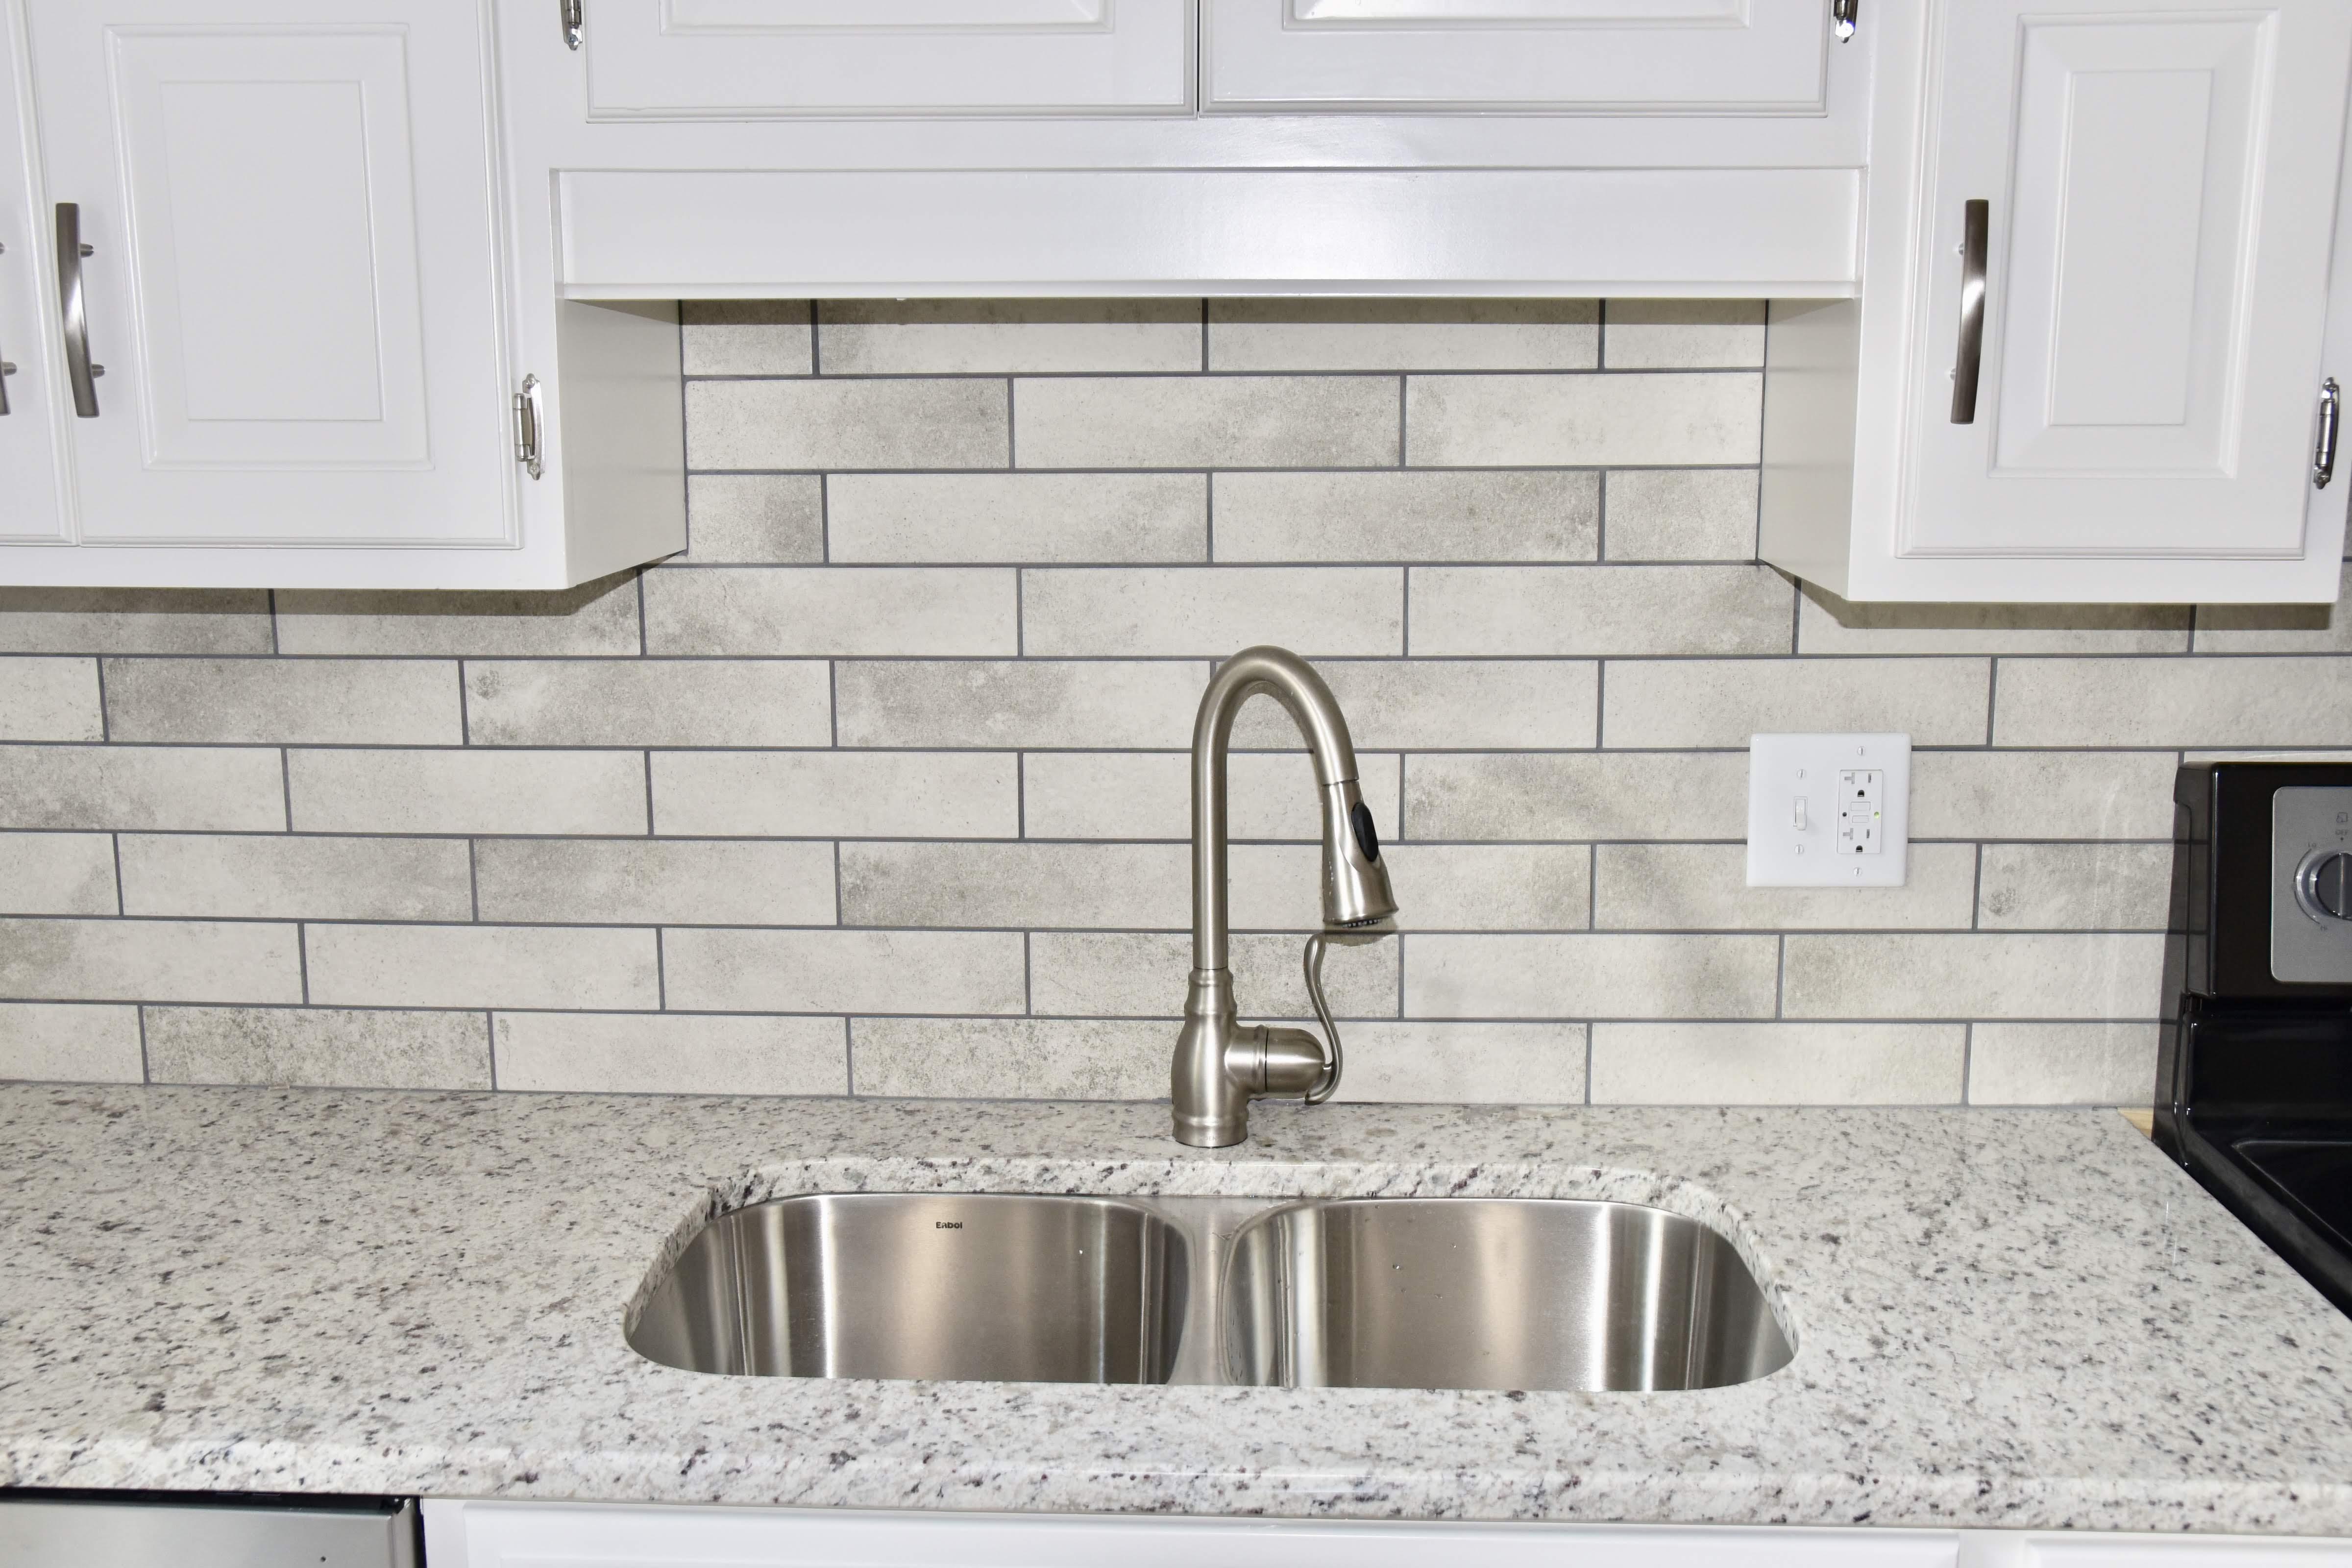 Kitchen Remodel Tile Backsplash. Newly installed granite ... on Granite Stove Backsplash  id=40846